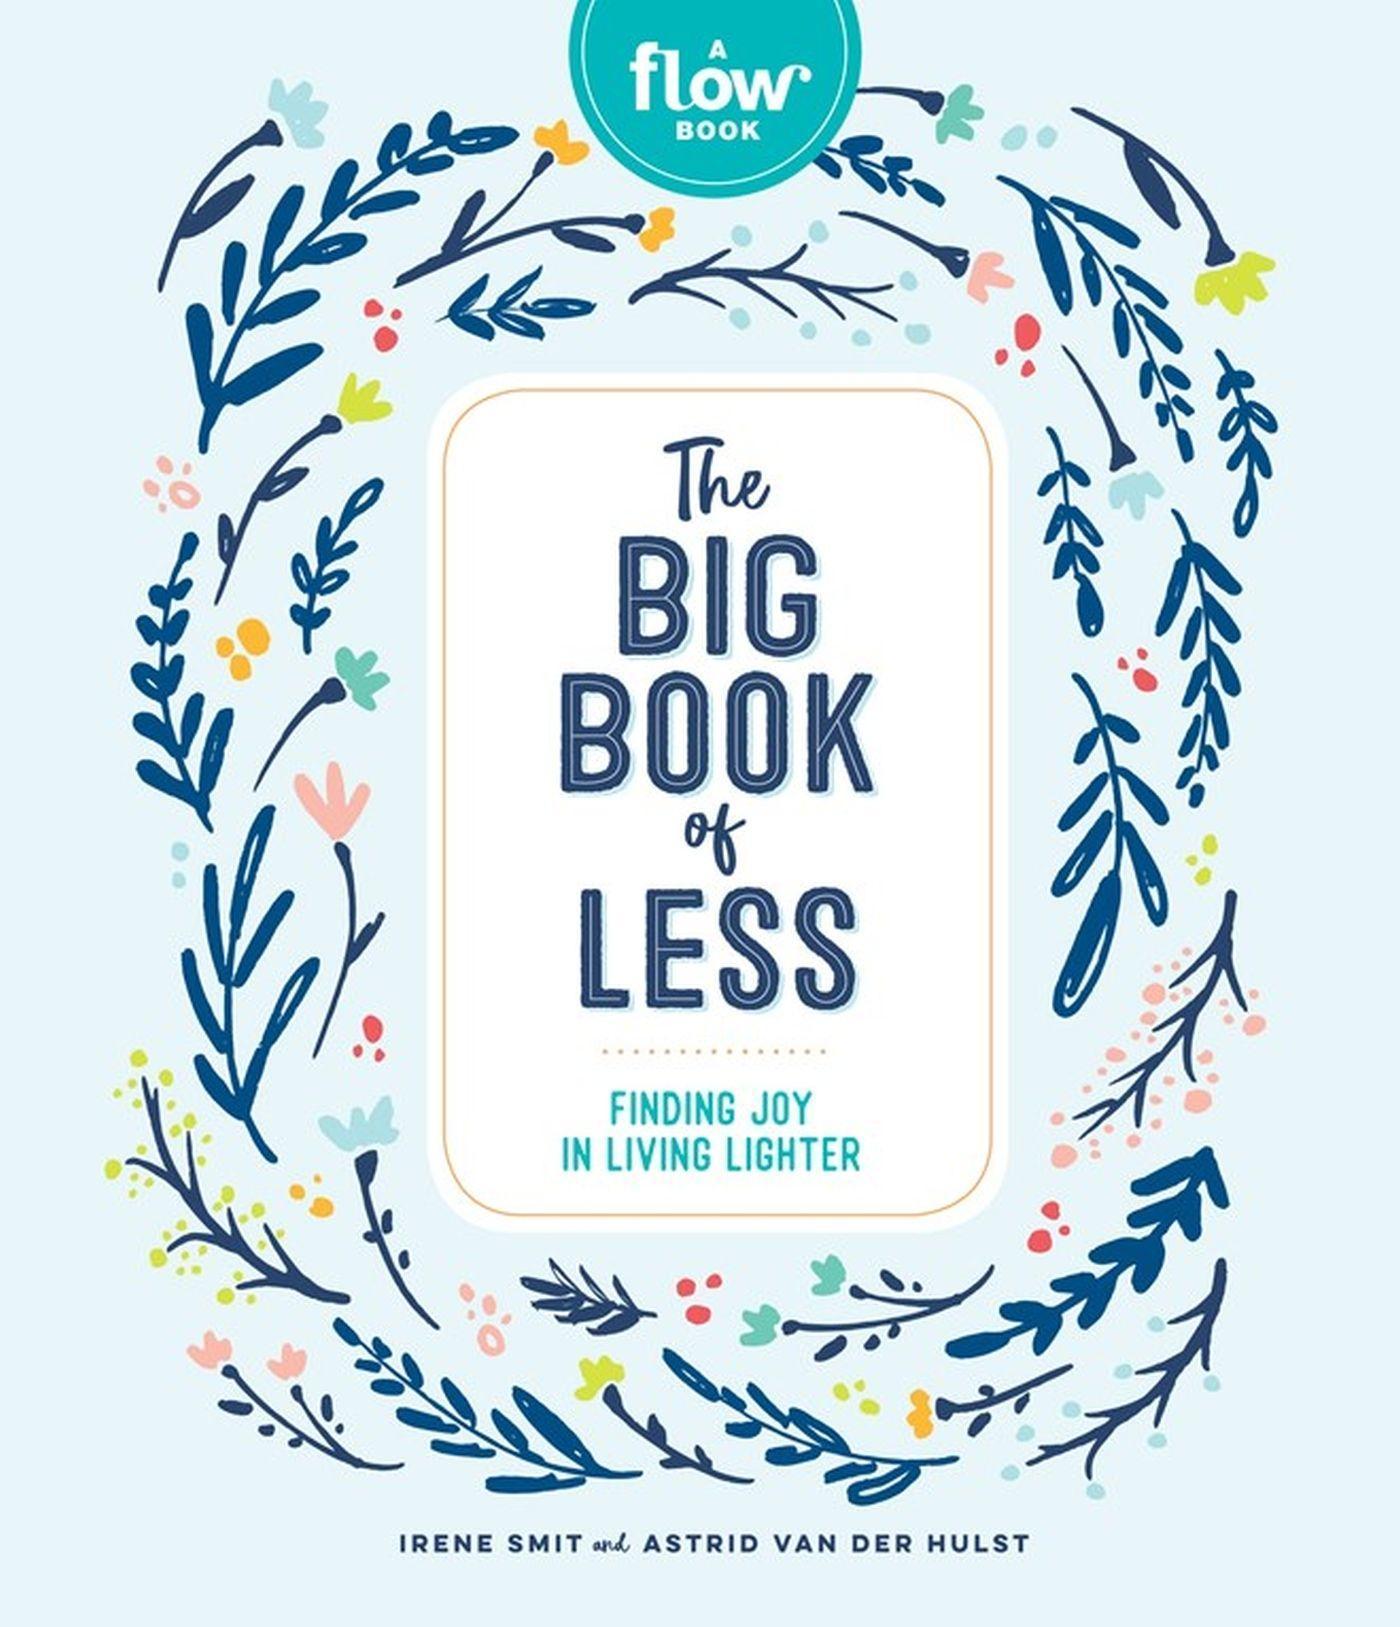 Flow: The Big Book of Less  Irene Smit  Buch  Flow  Englisch  2019 - Smit, Irene